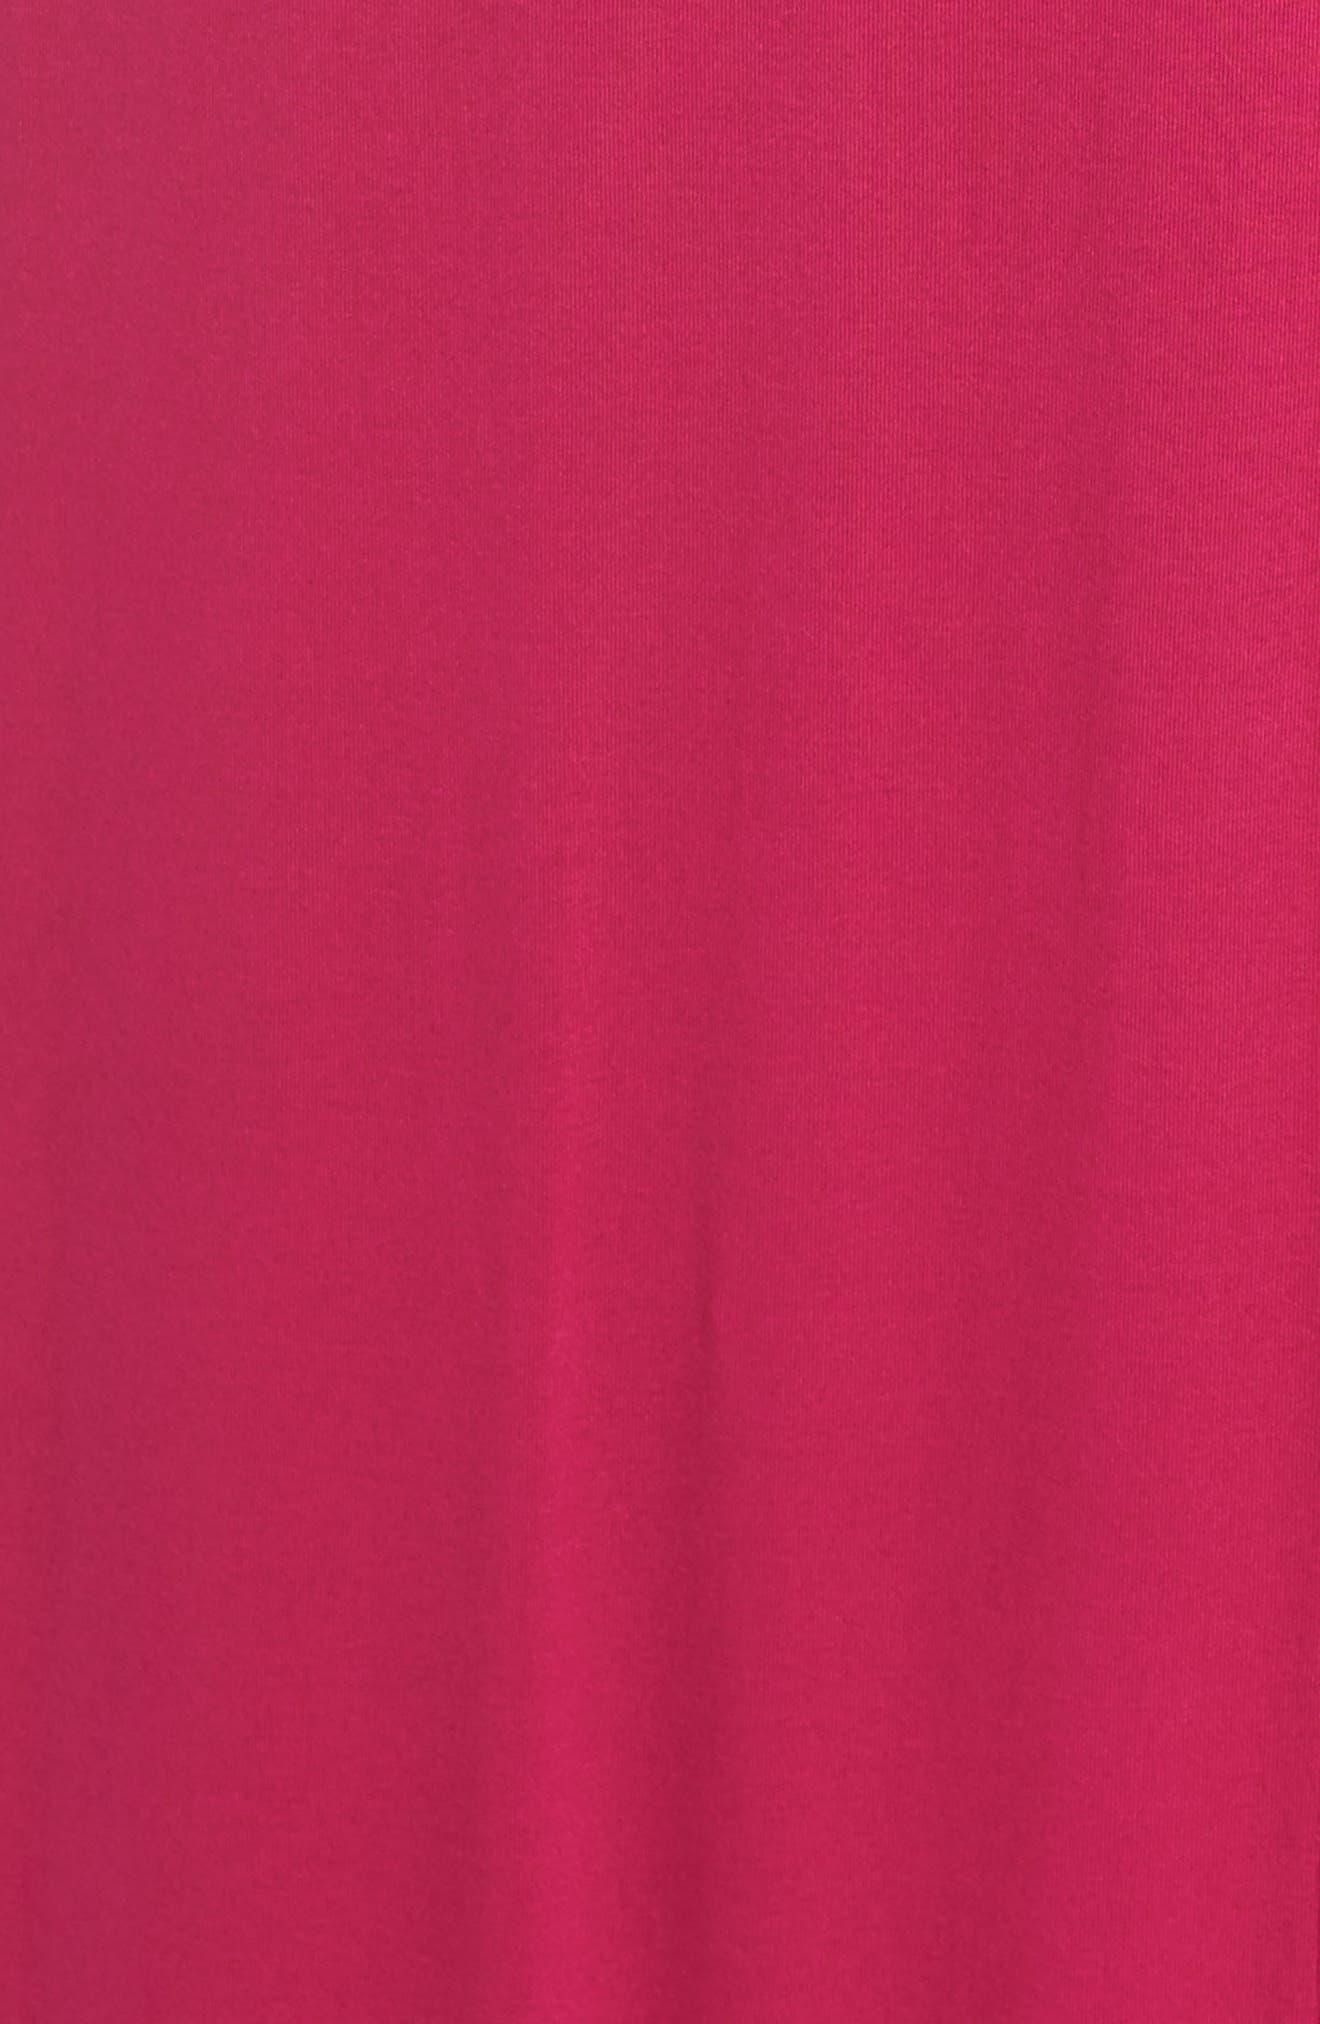 Jersey Maxi Dress,                             Alternate thumbnail 6, color,                             650